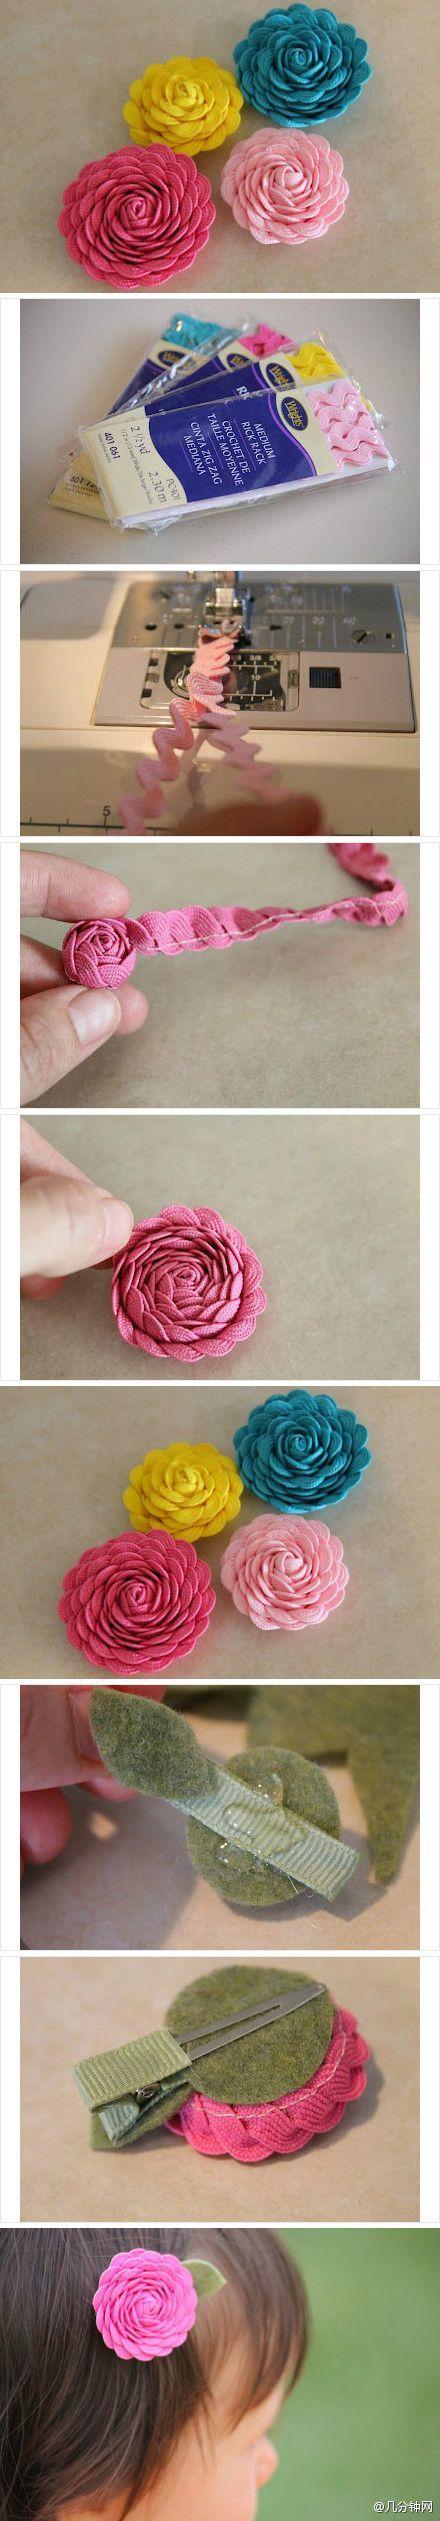 Rick-rack flowers DIY @Cathryn Matheson Matheson Matheson Matheson Jean Palmer jensen.